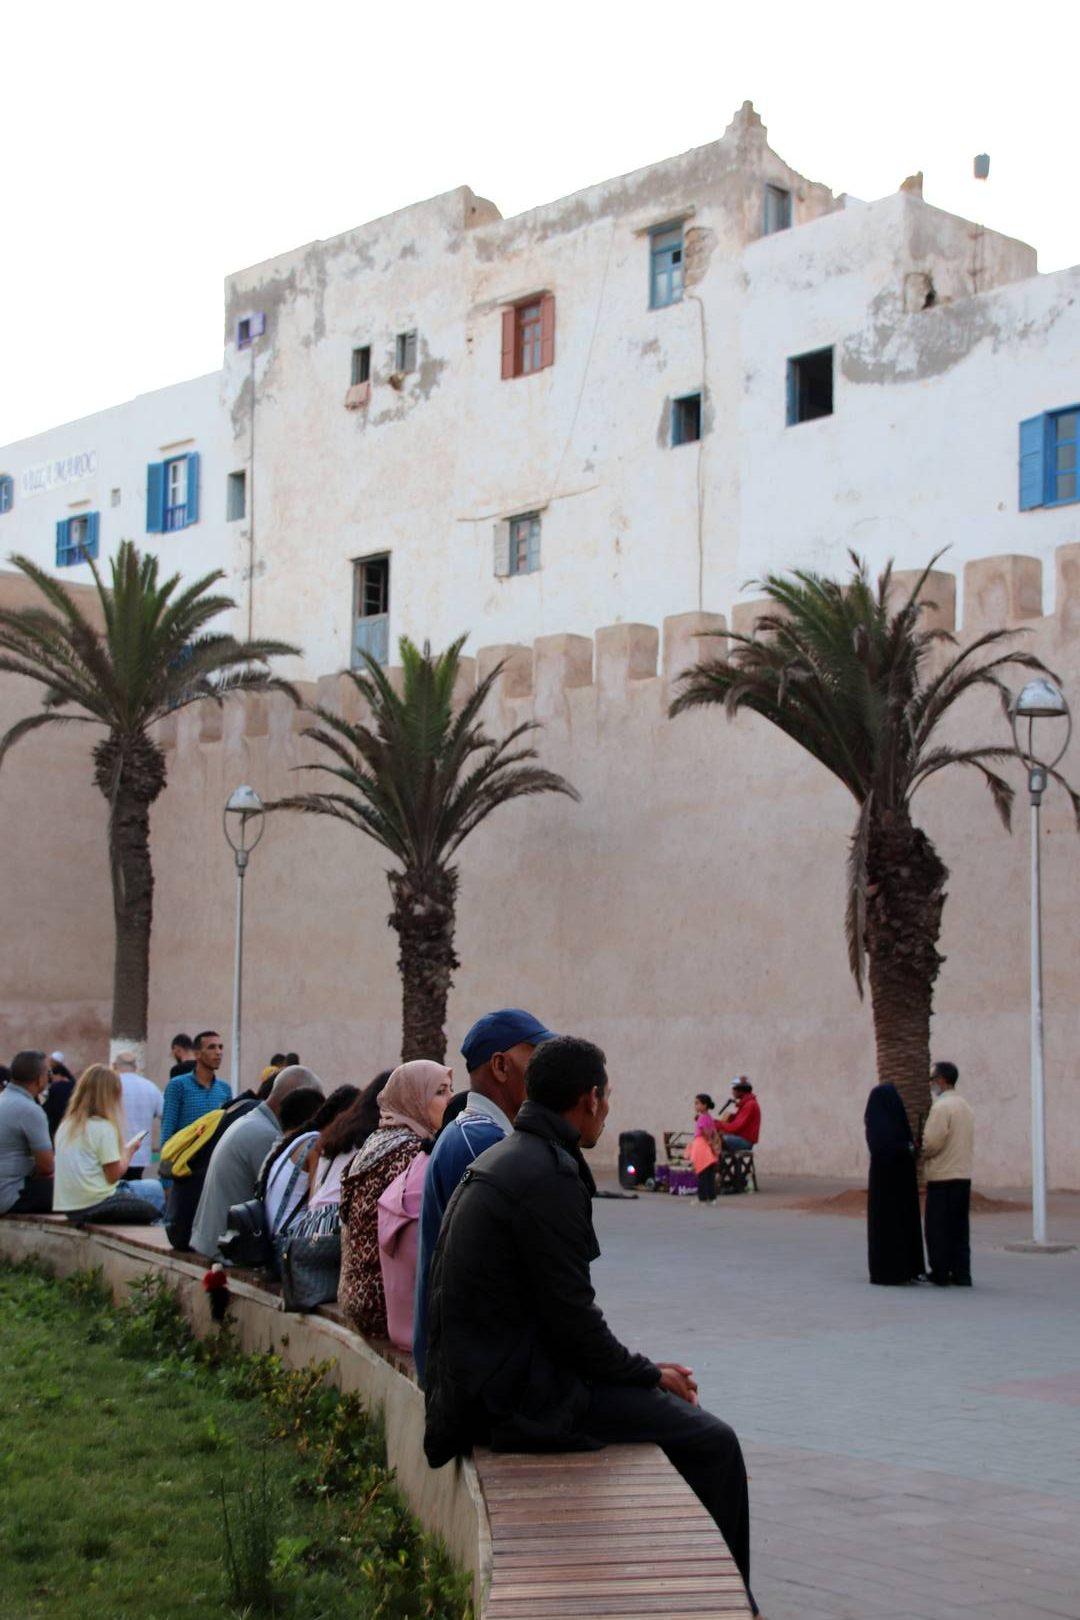 Maroc - Remparts de la médina d'Essaouira